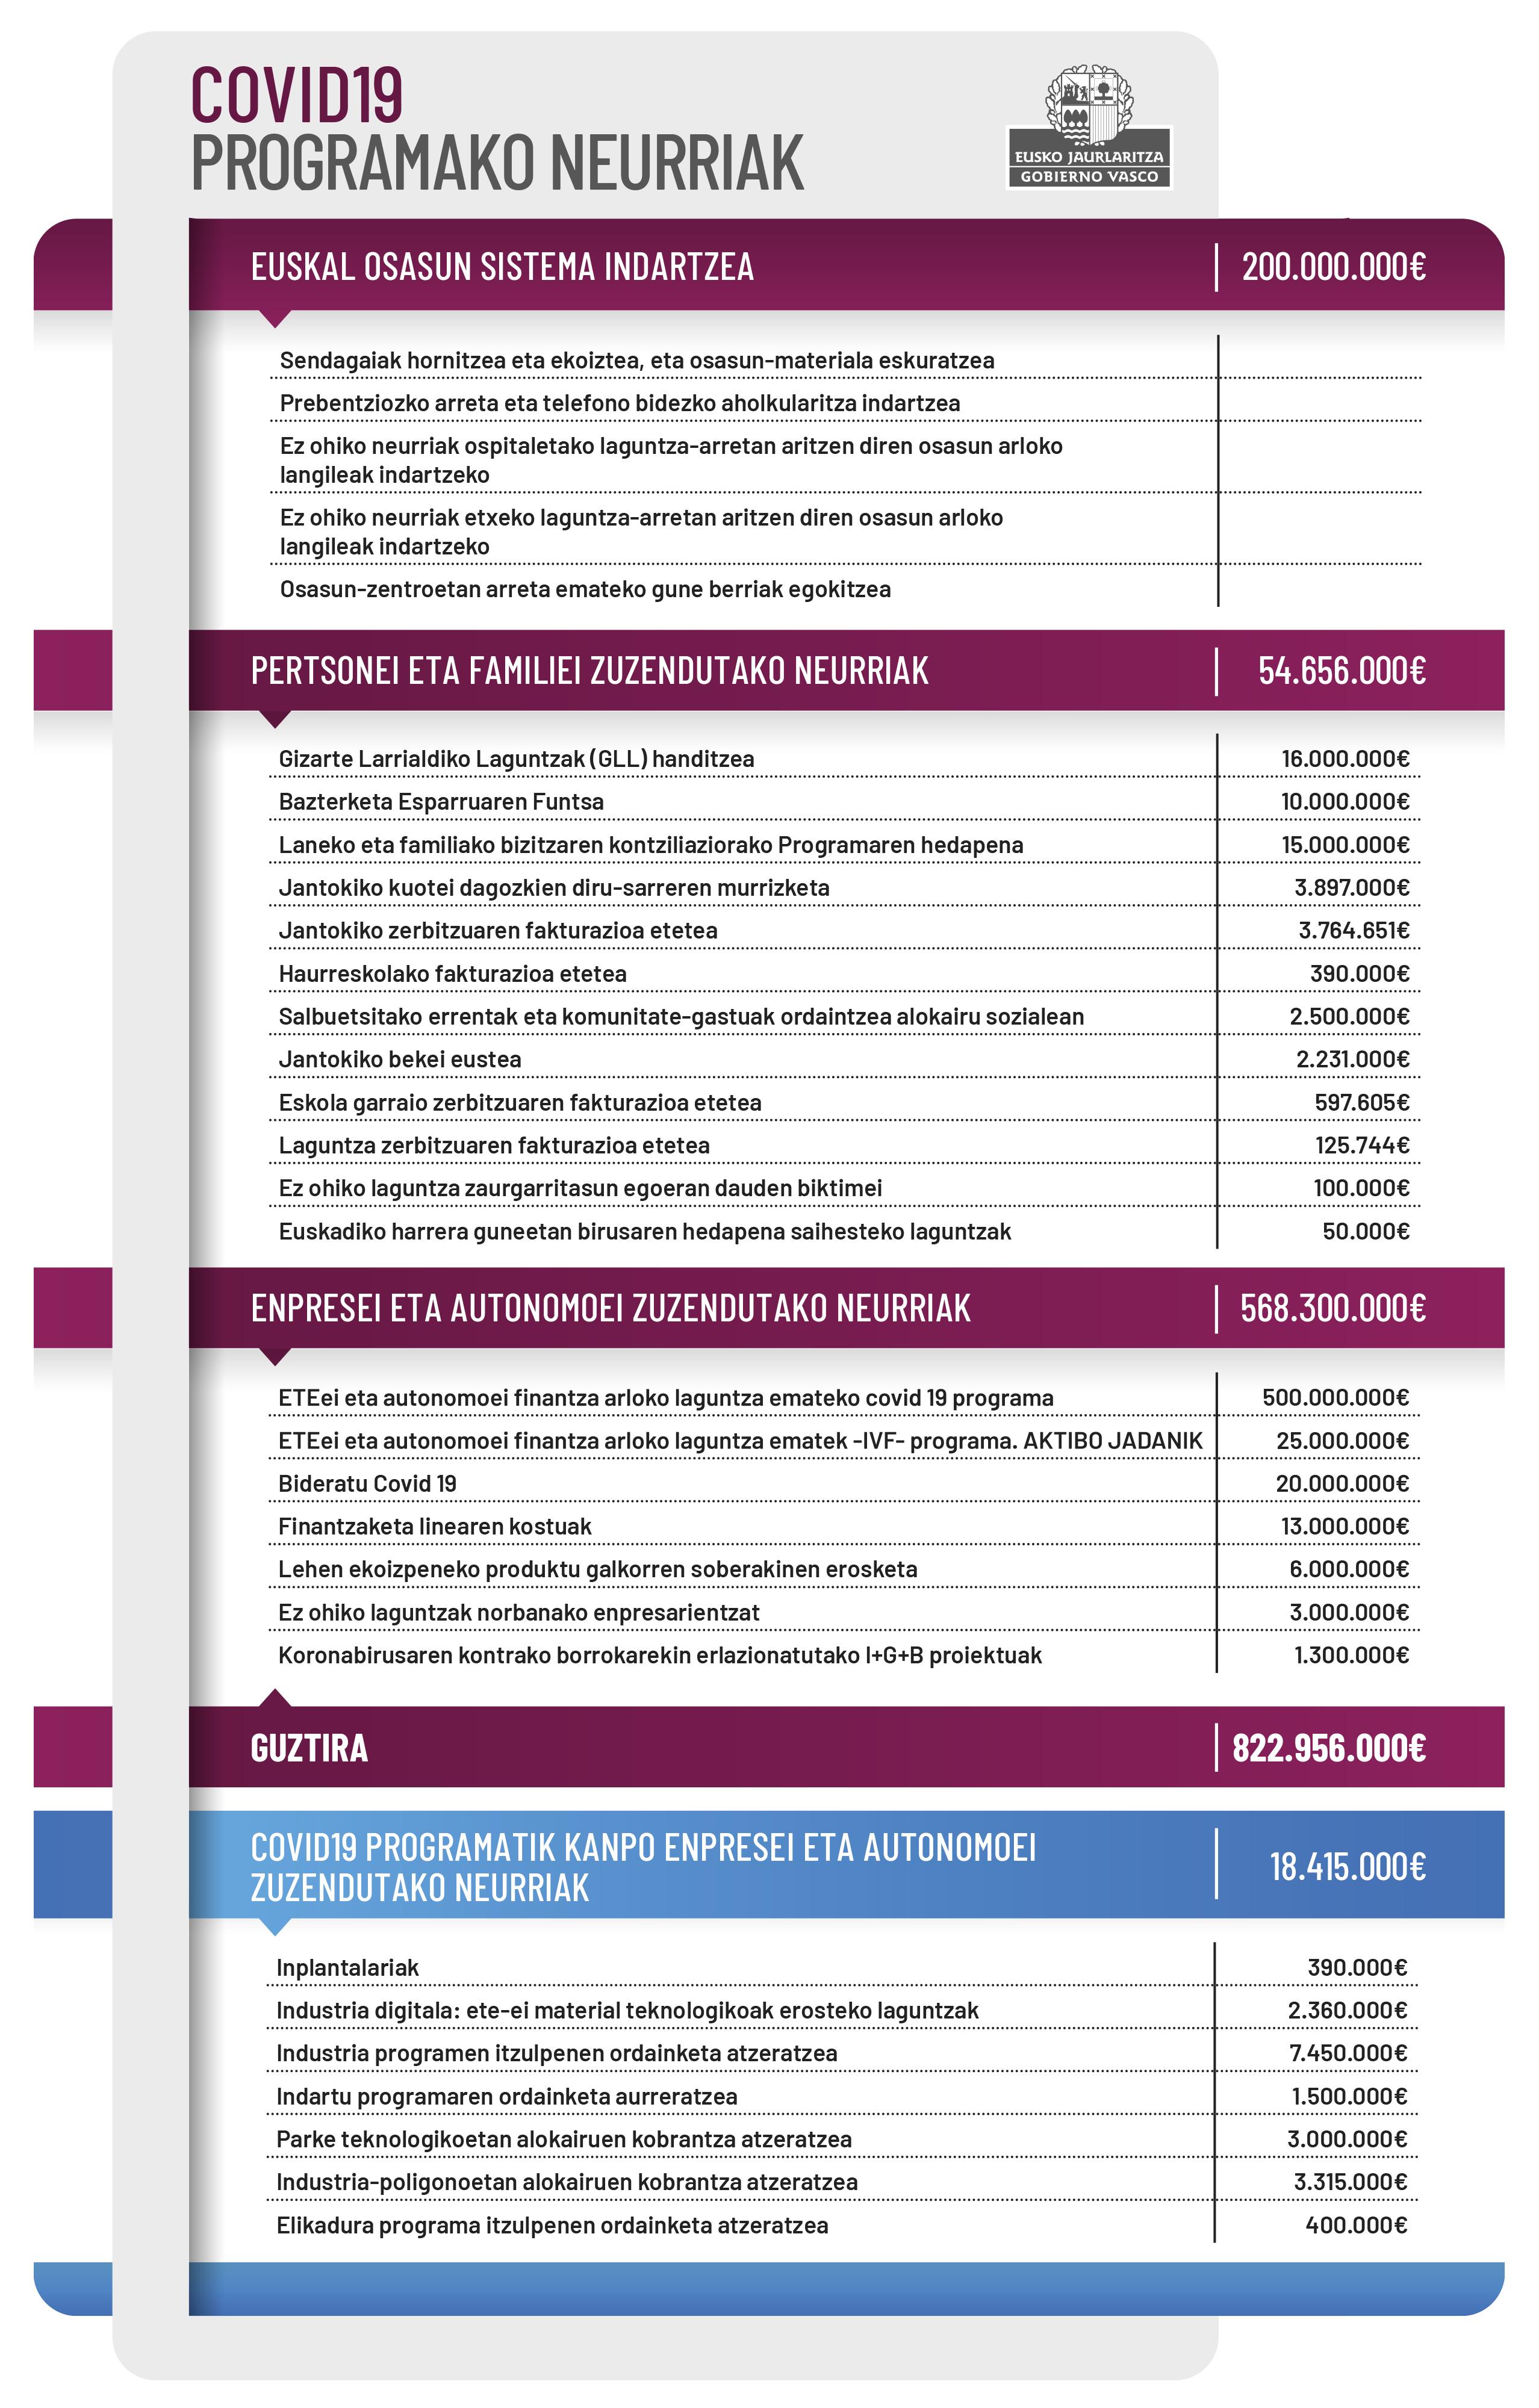 COVID19_Infografia_Medidas_EUS_01__1_.jpg